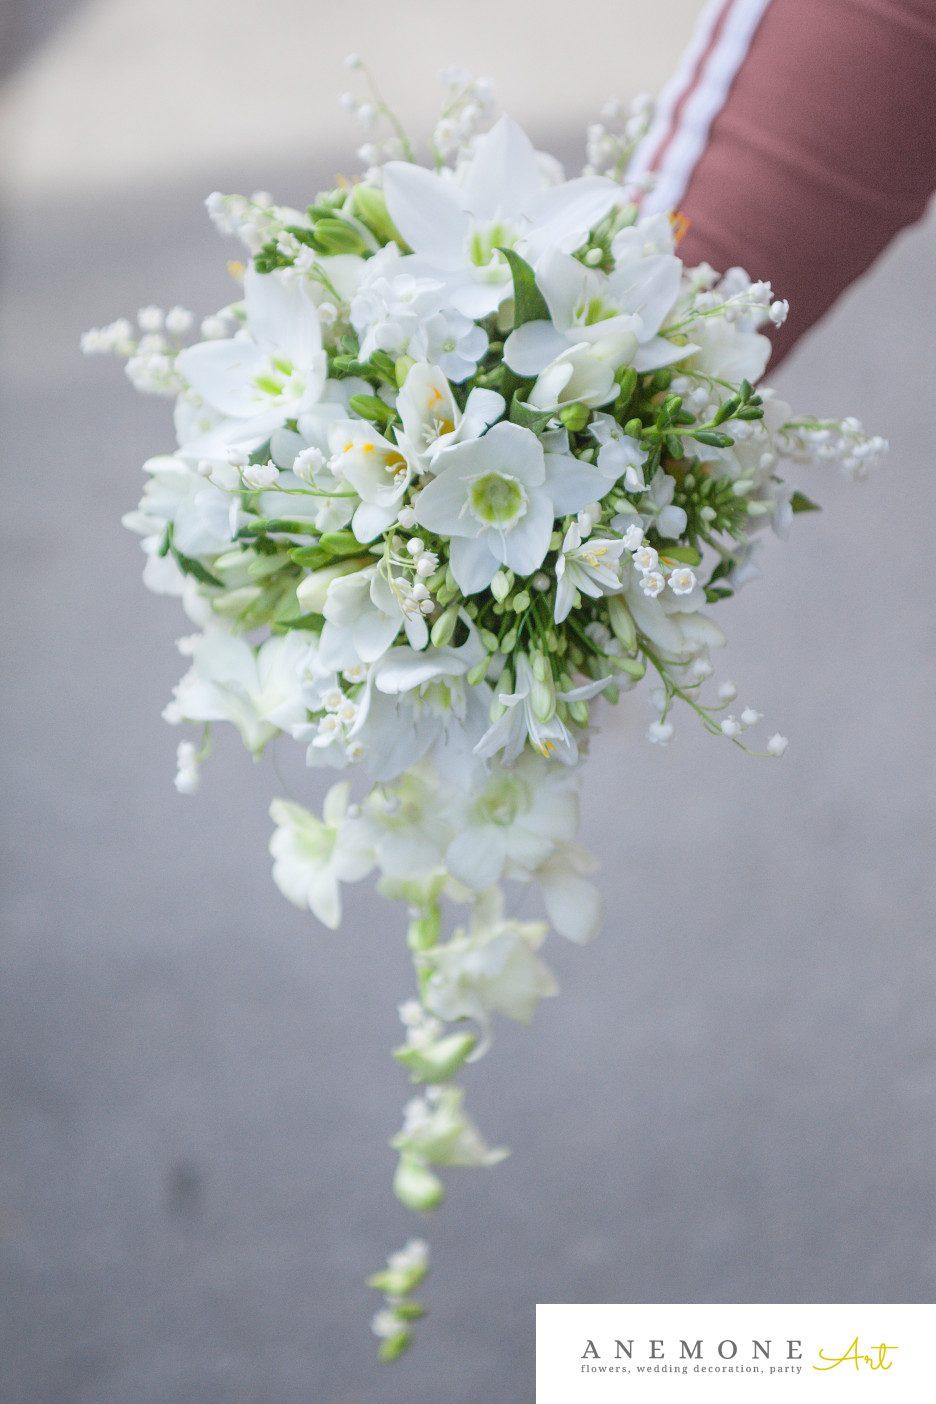 Poza, foto cu Flori de nunta alb, buchet mireasa, curgator, dendrobium, eucharis, frezii, lacramioare, orhidee, phlox in Arad, Timisoara, Oradea (wedding flowers, bouquets) nunta Arad, Timisoara, Oradea